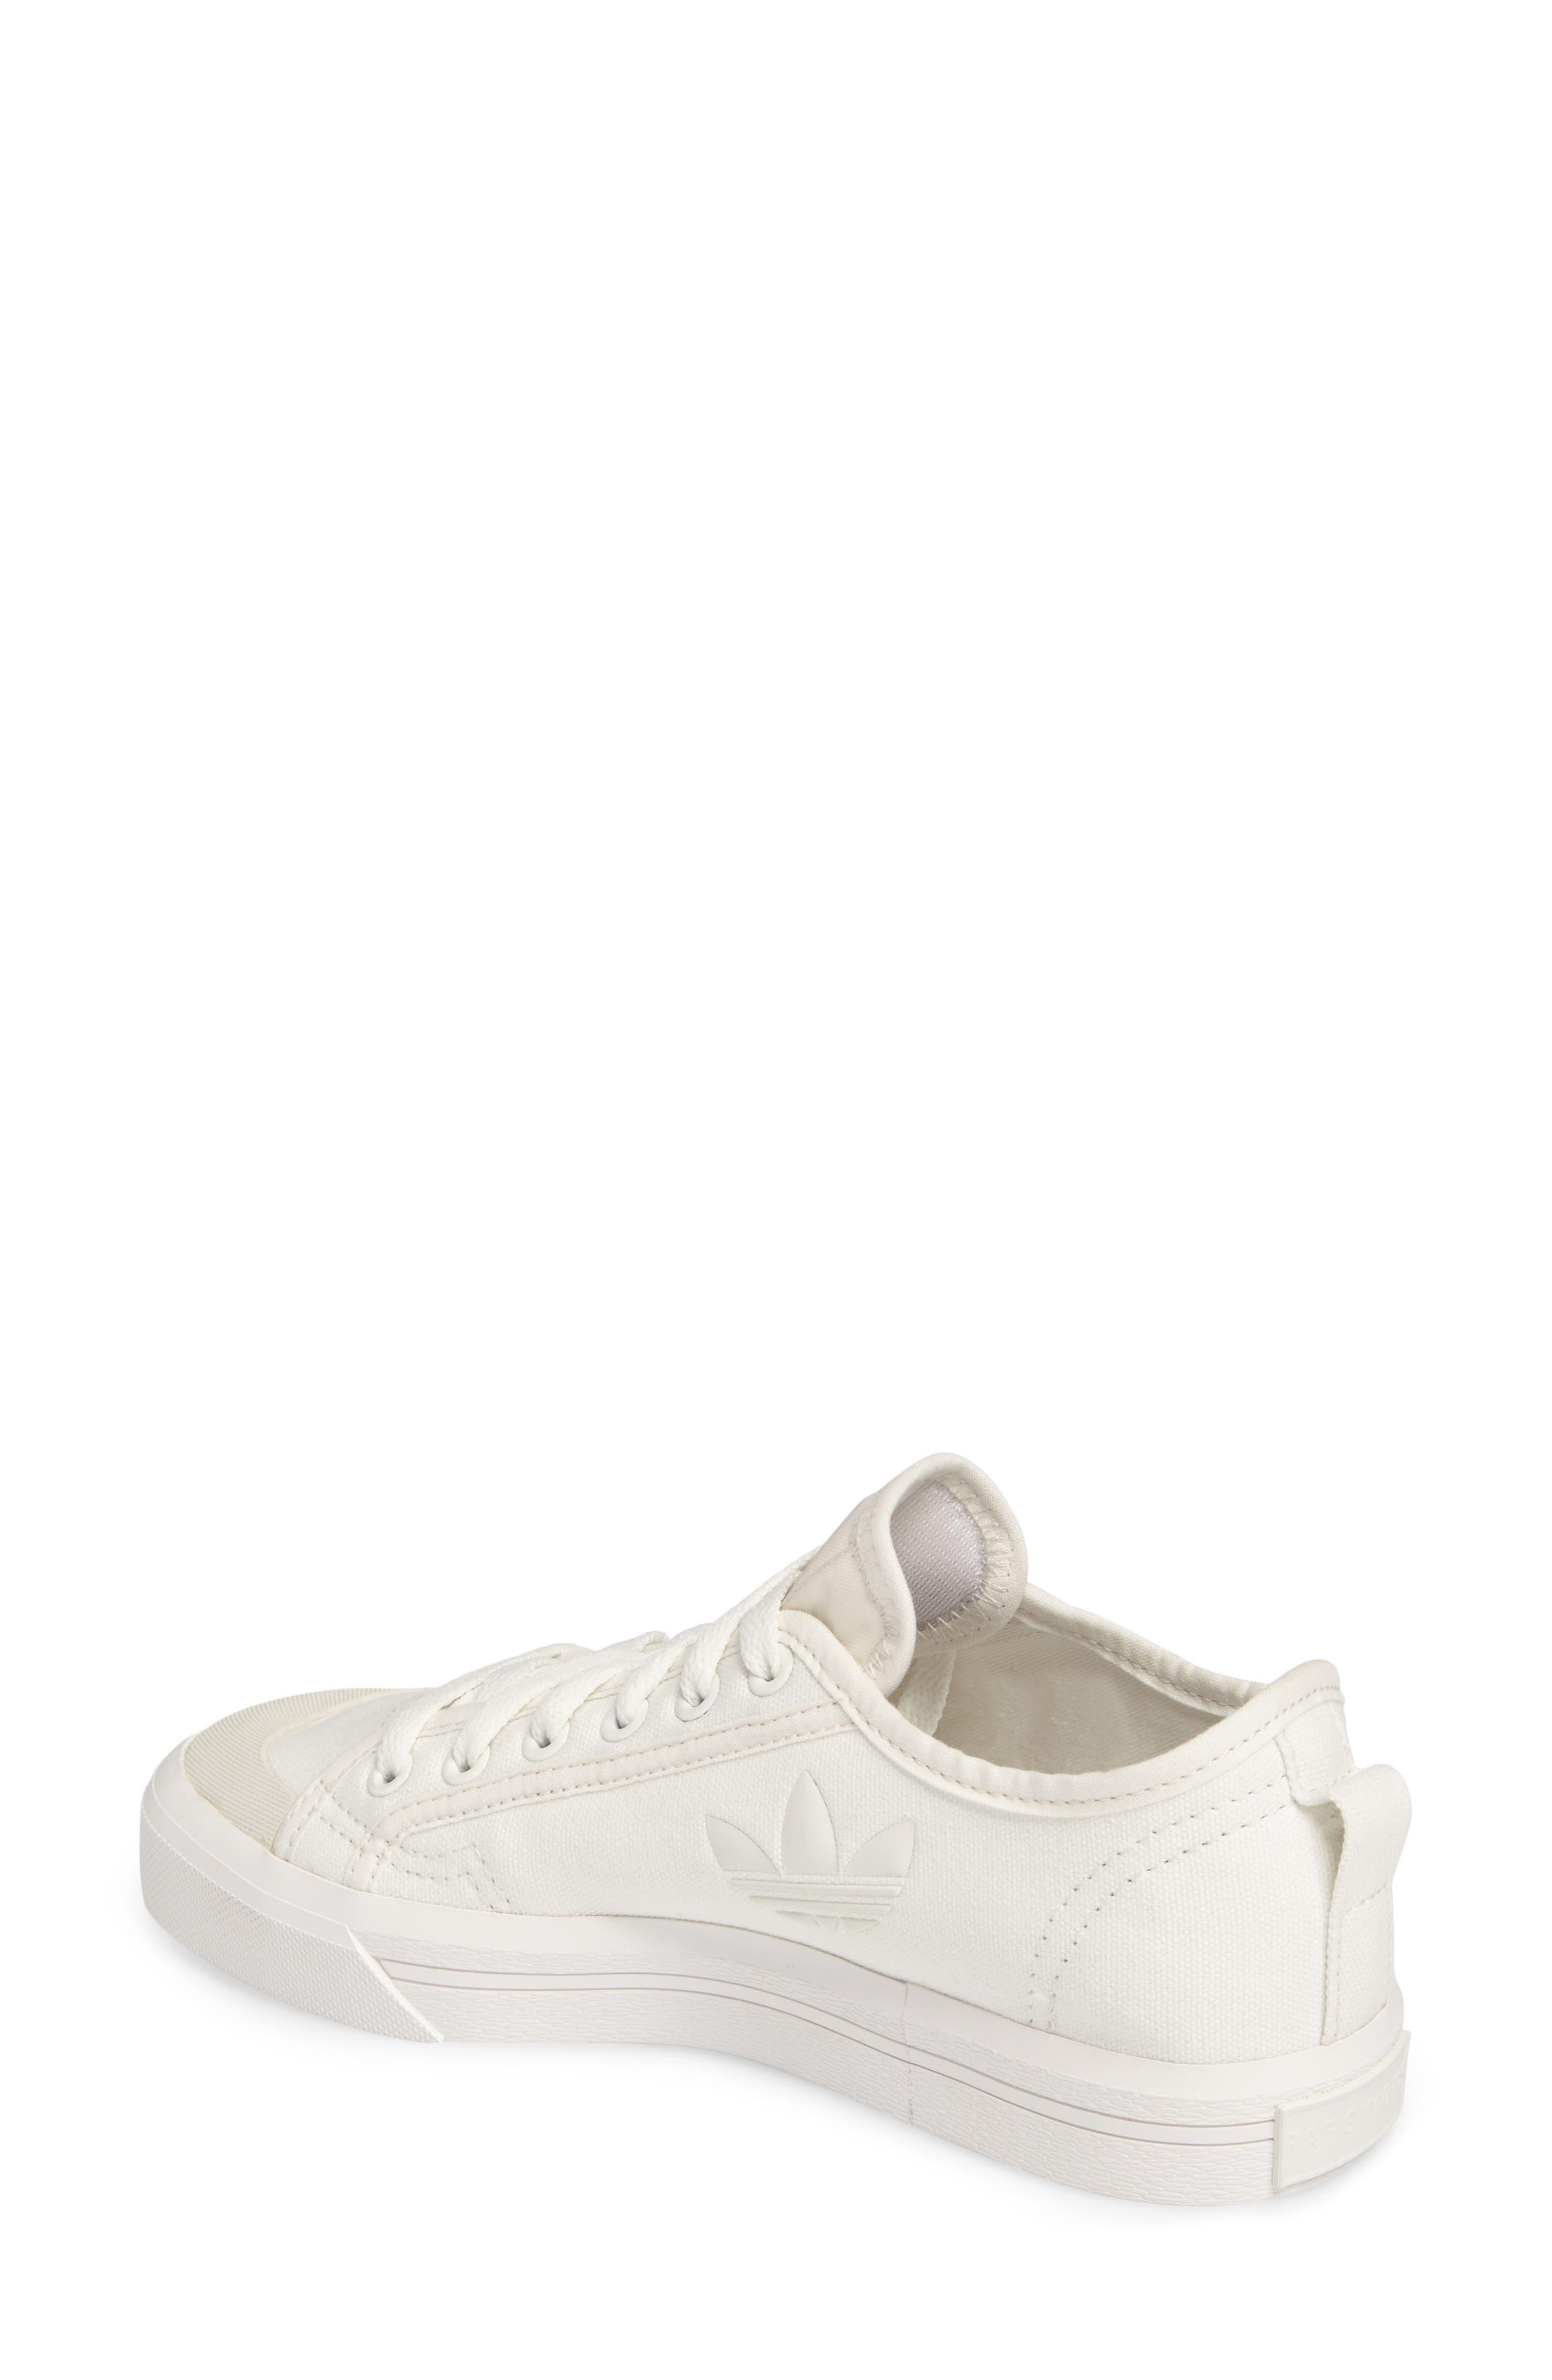 adidas by Raf Simons Spirit Low Top Sneaker,                             Alternate thumbnail 4, color,